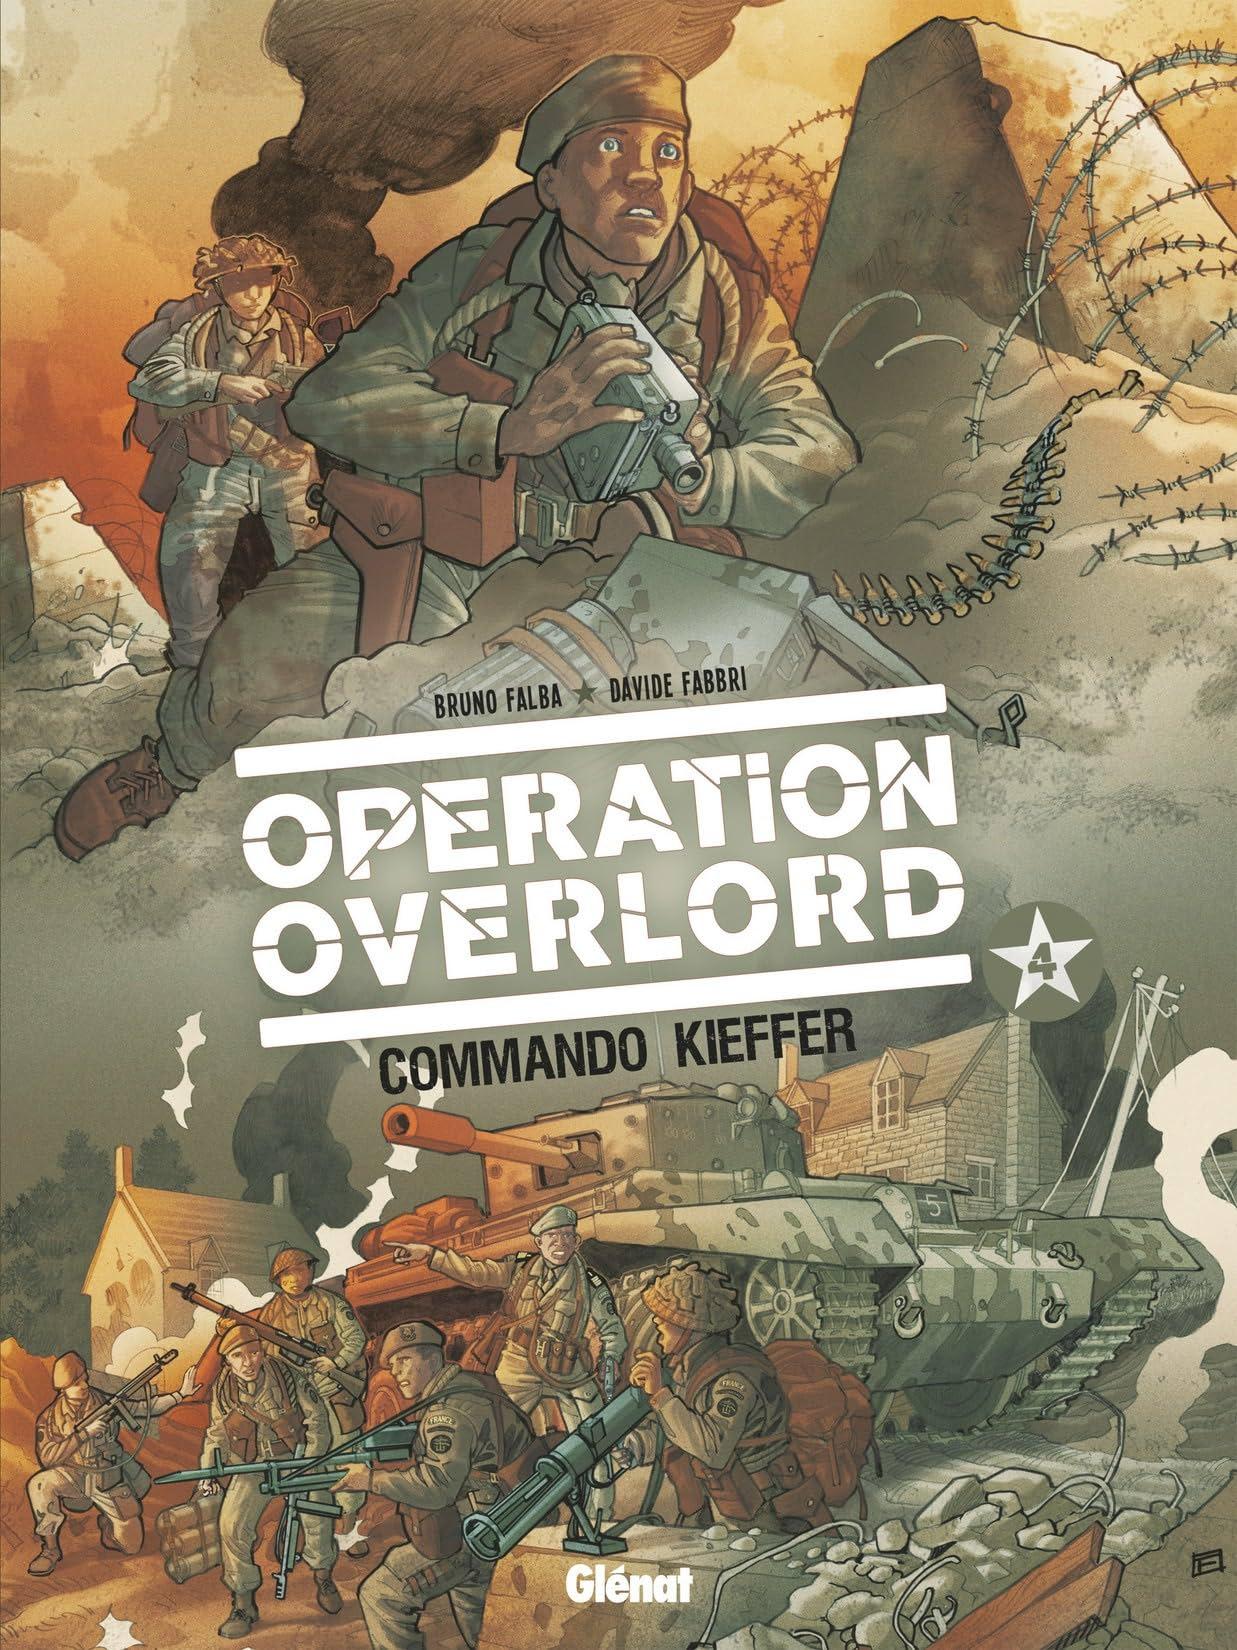 Opération Overlord Vol. 4: Commando Kieffer